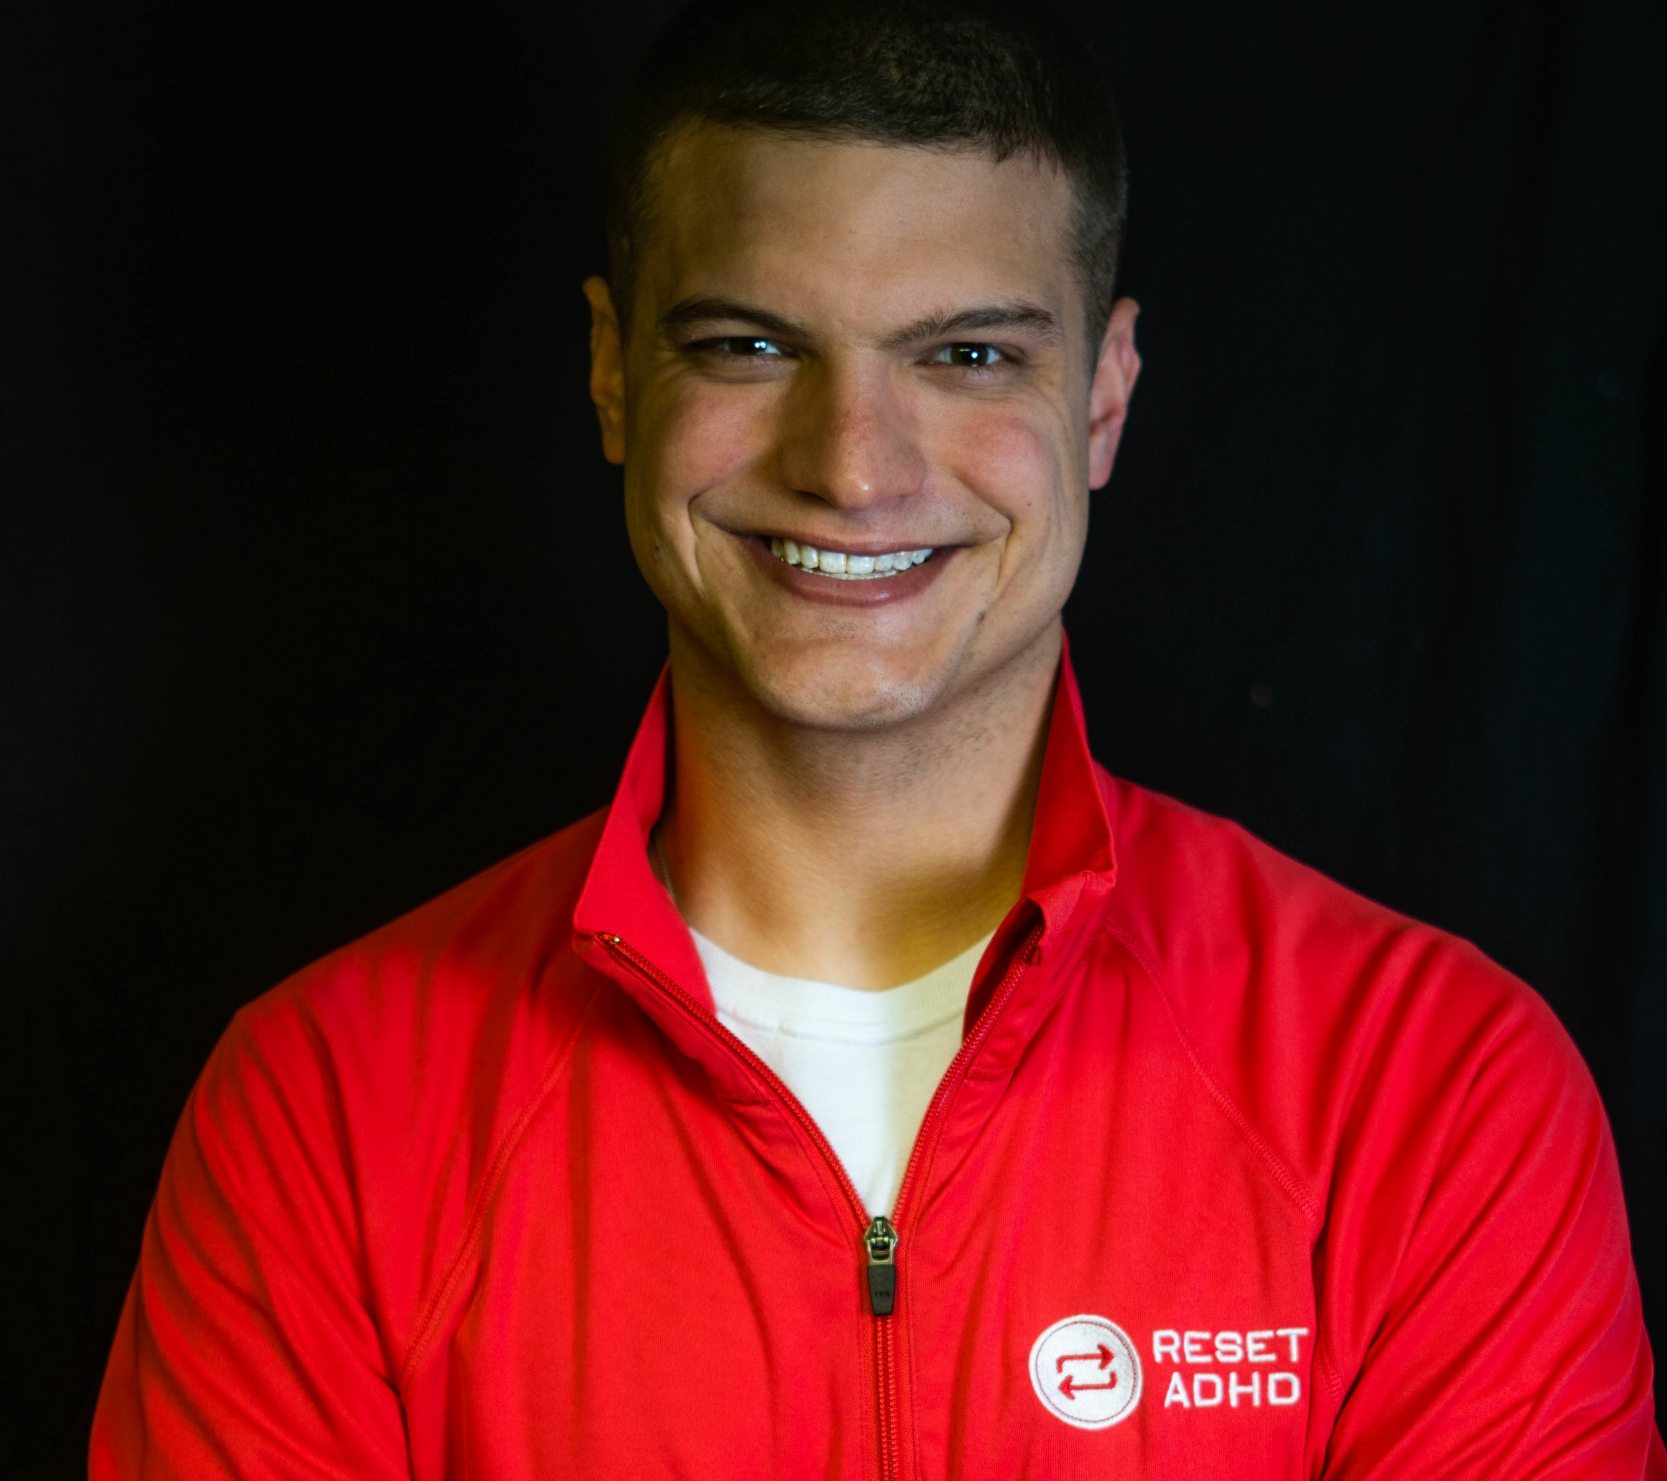 Alex Hey - The Best ADHD Coach in the State of south Dakota